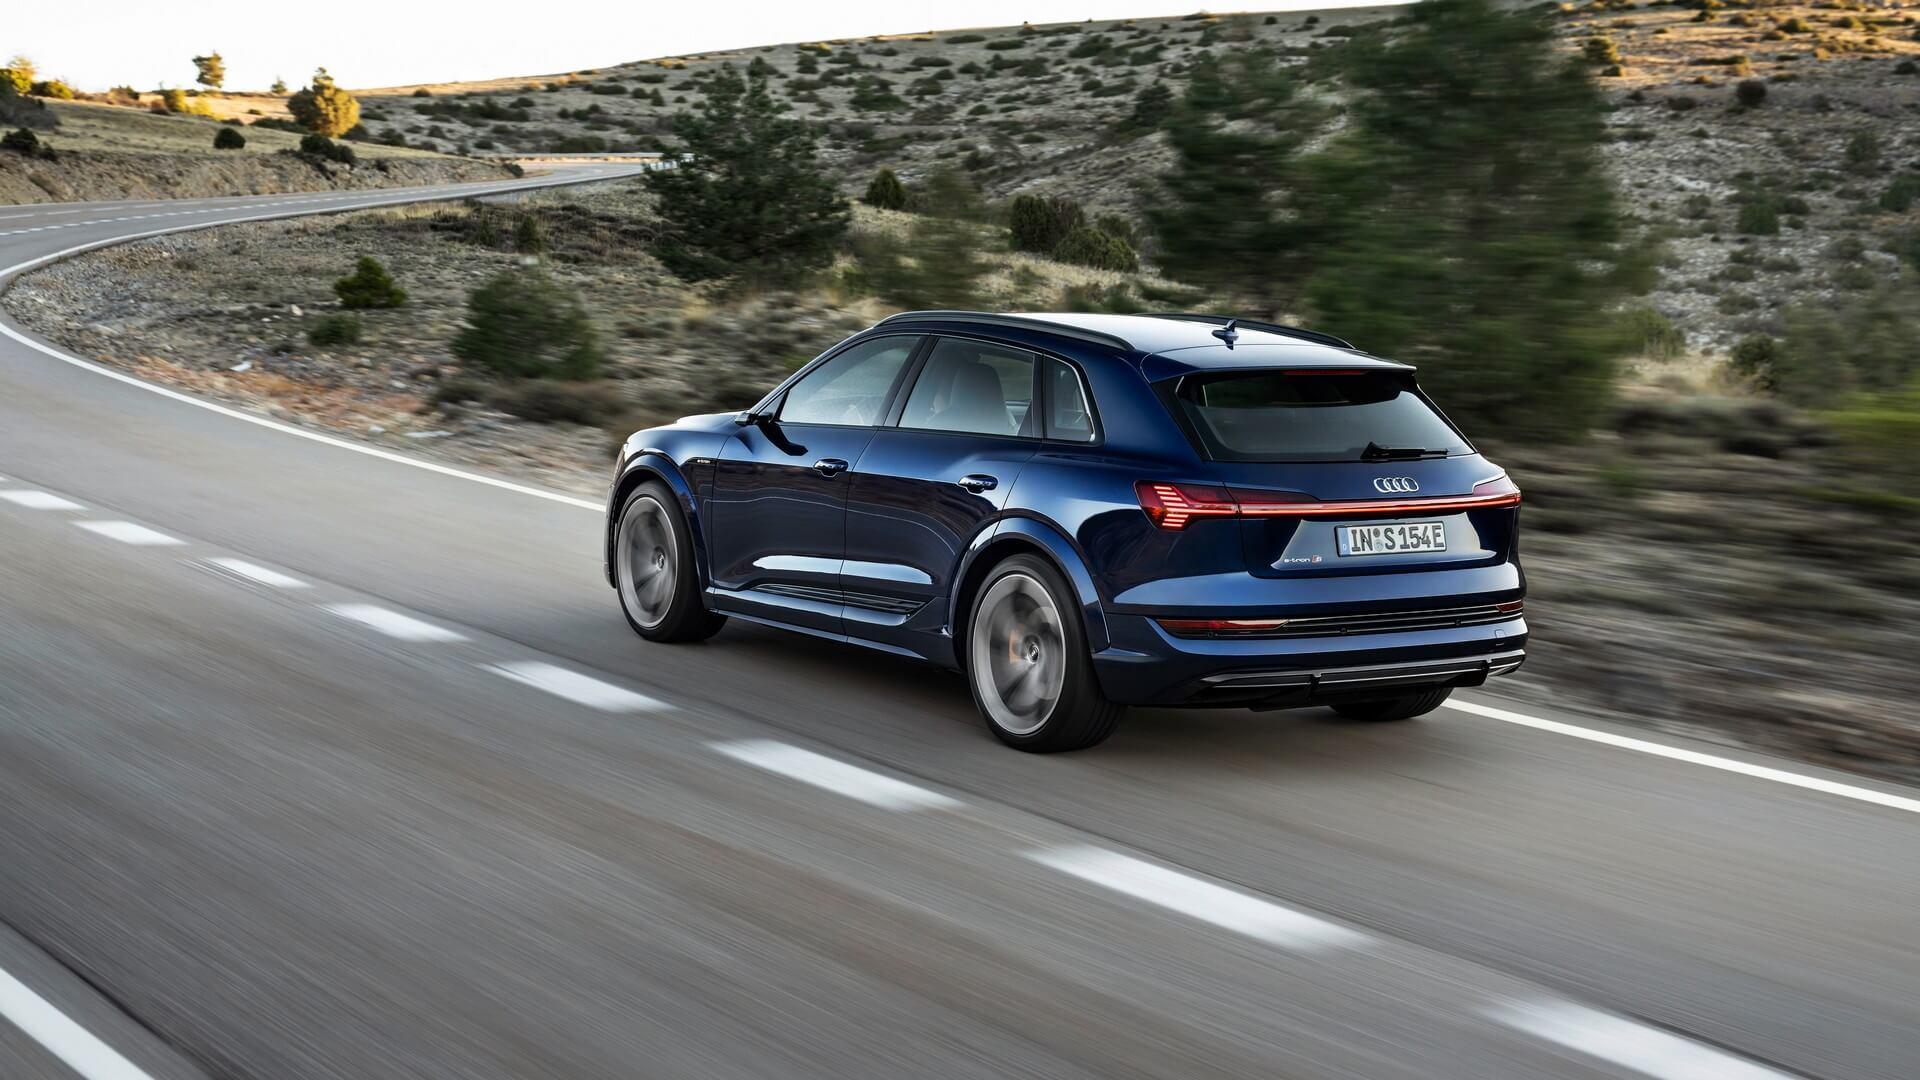 Audi-E-Tron-S-and-E-Tron-S-Sportback-2020-10